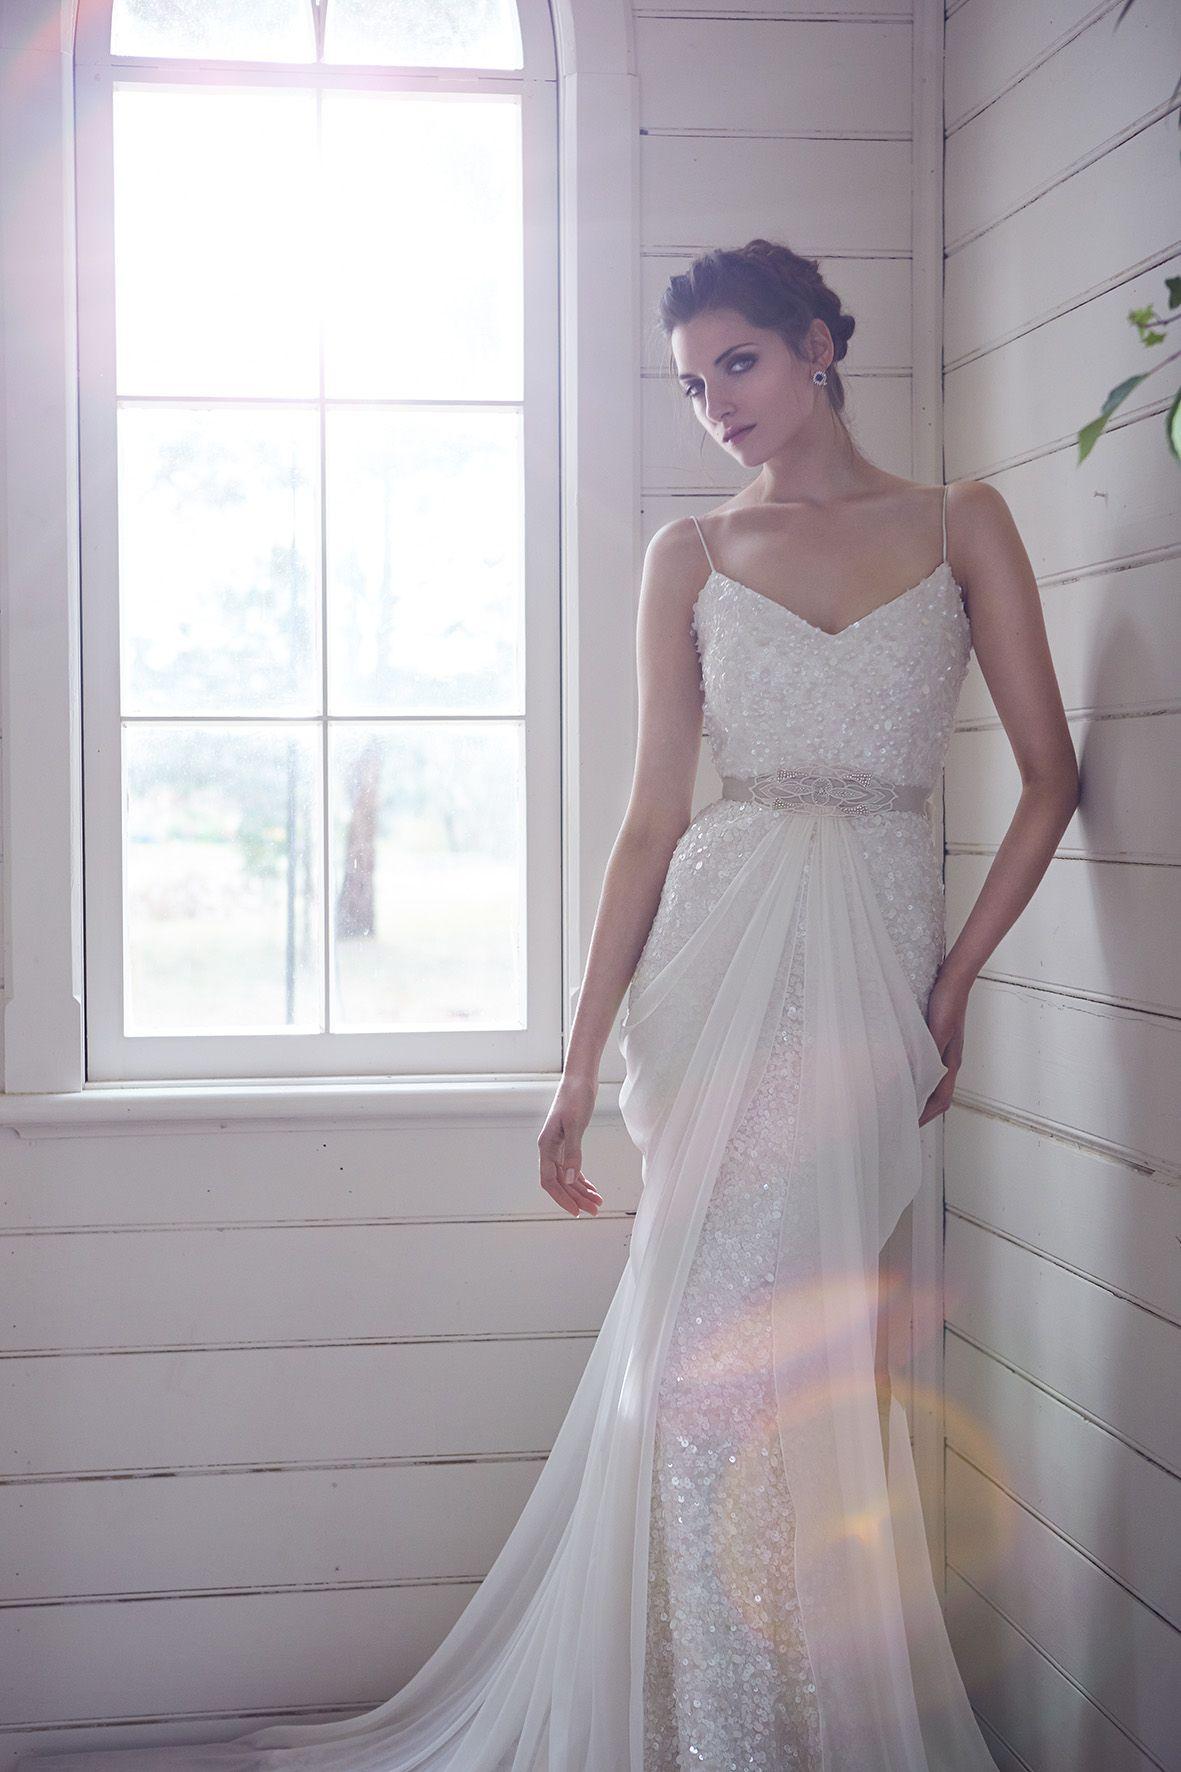 Stunning new dress from KWH Bespoke. #gown #dress #wedding #kwh #bespoke Shop: Karen Willis Holmes http://www.karenwillisholmes.com/us/bridal-gown-collections/bespoke-collection/